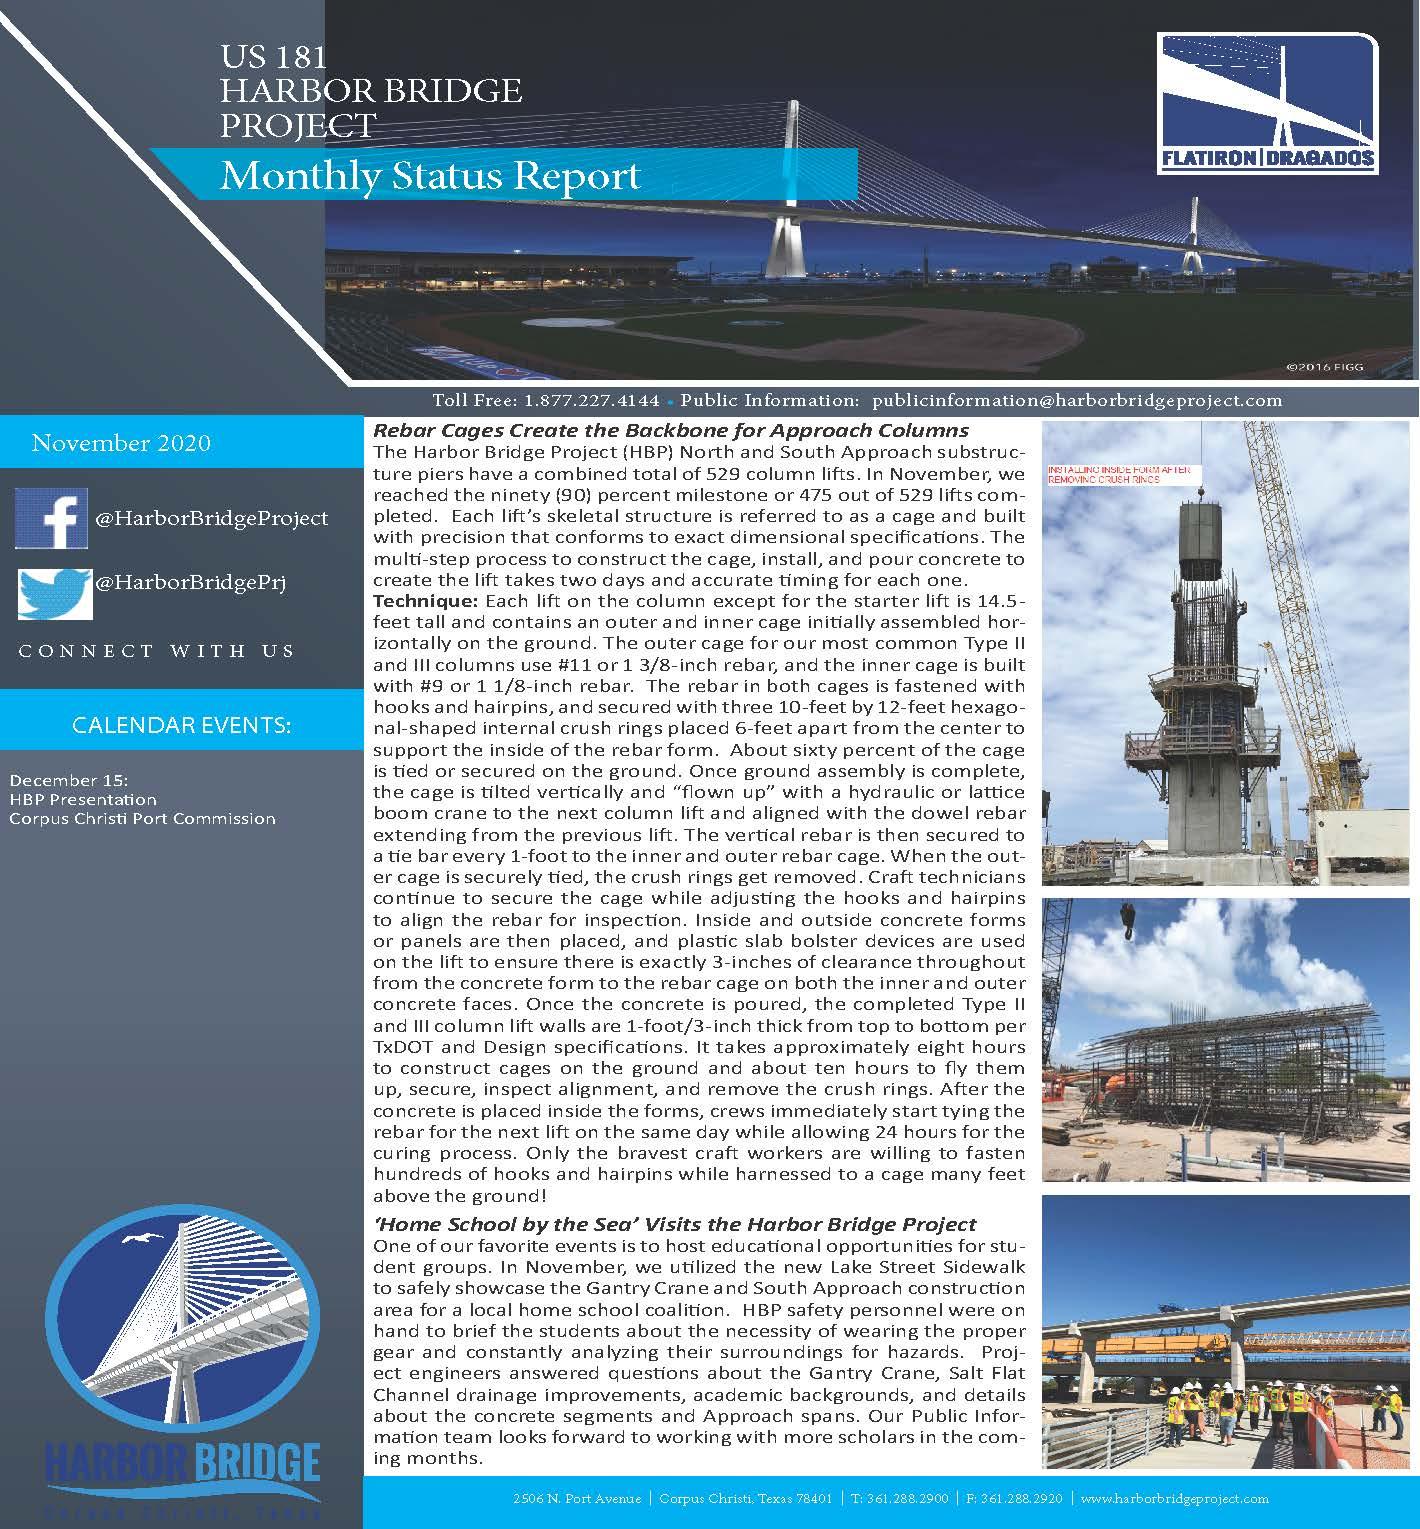 November 2020 Monthly Status Report